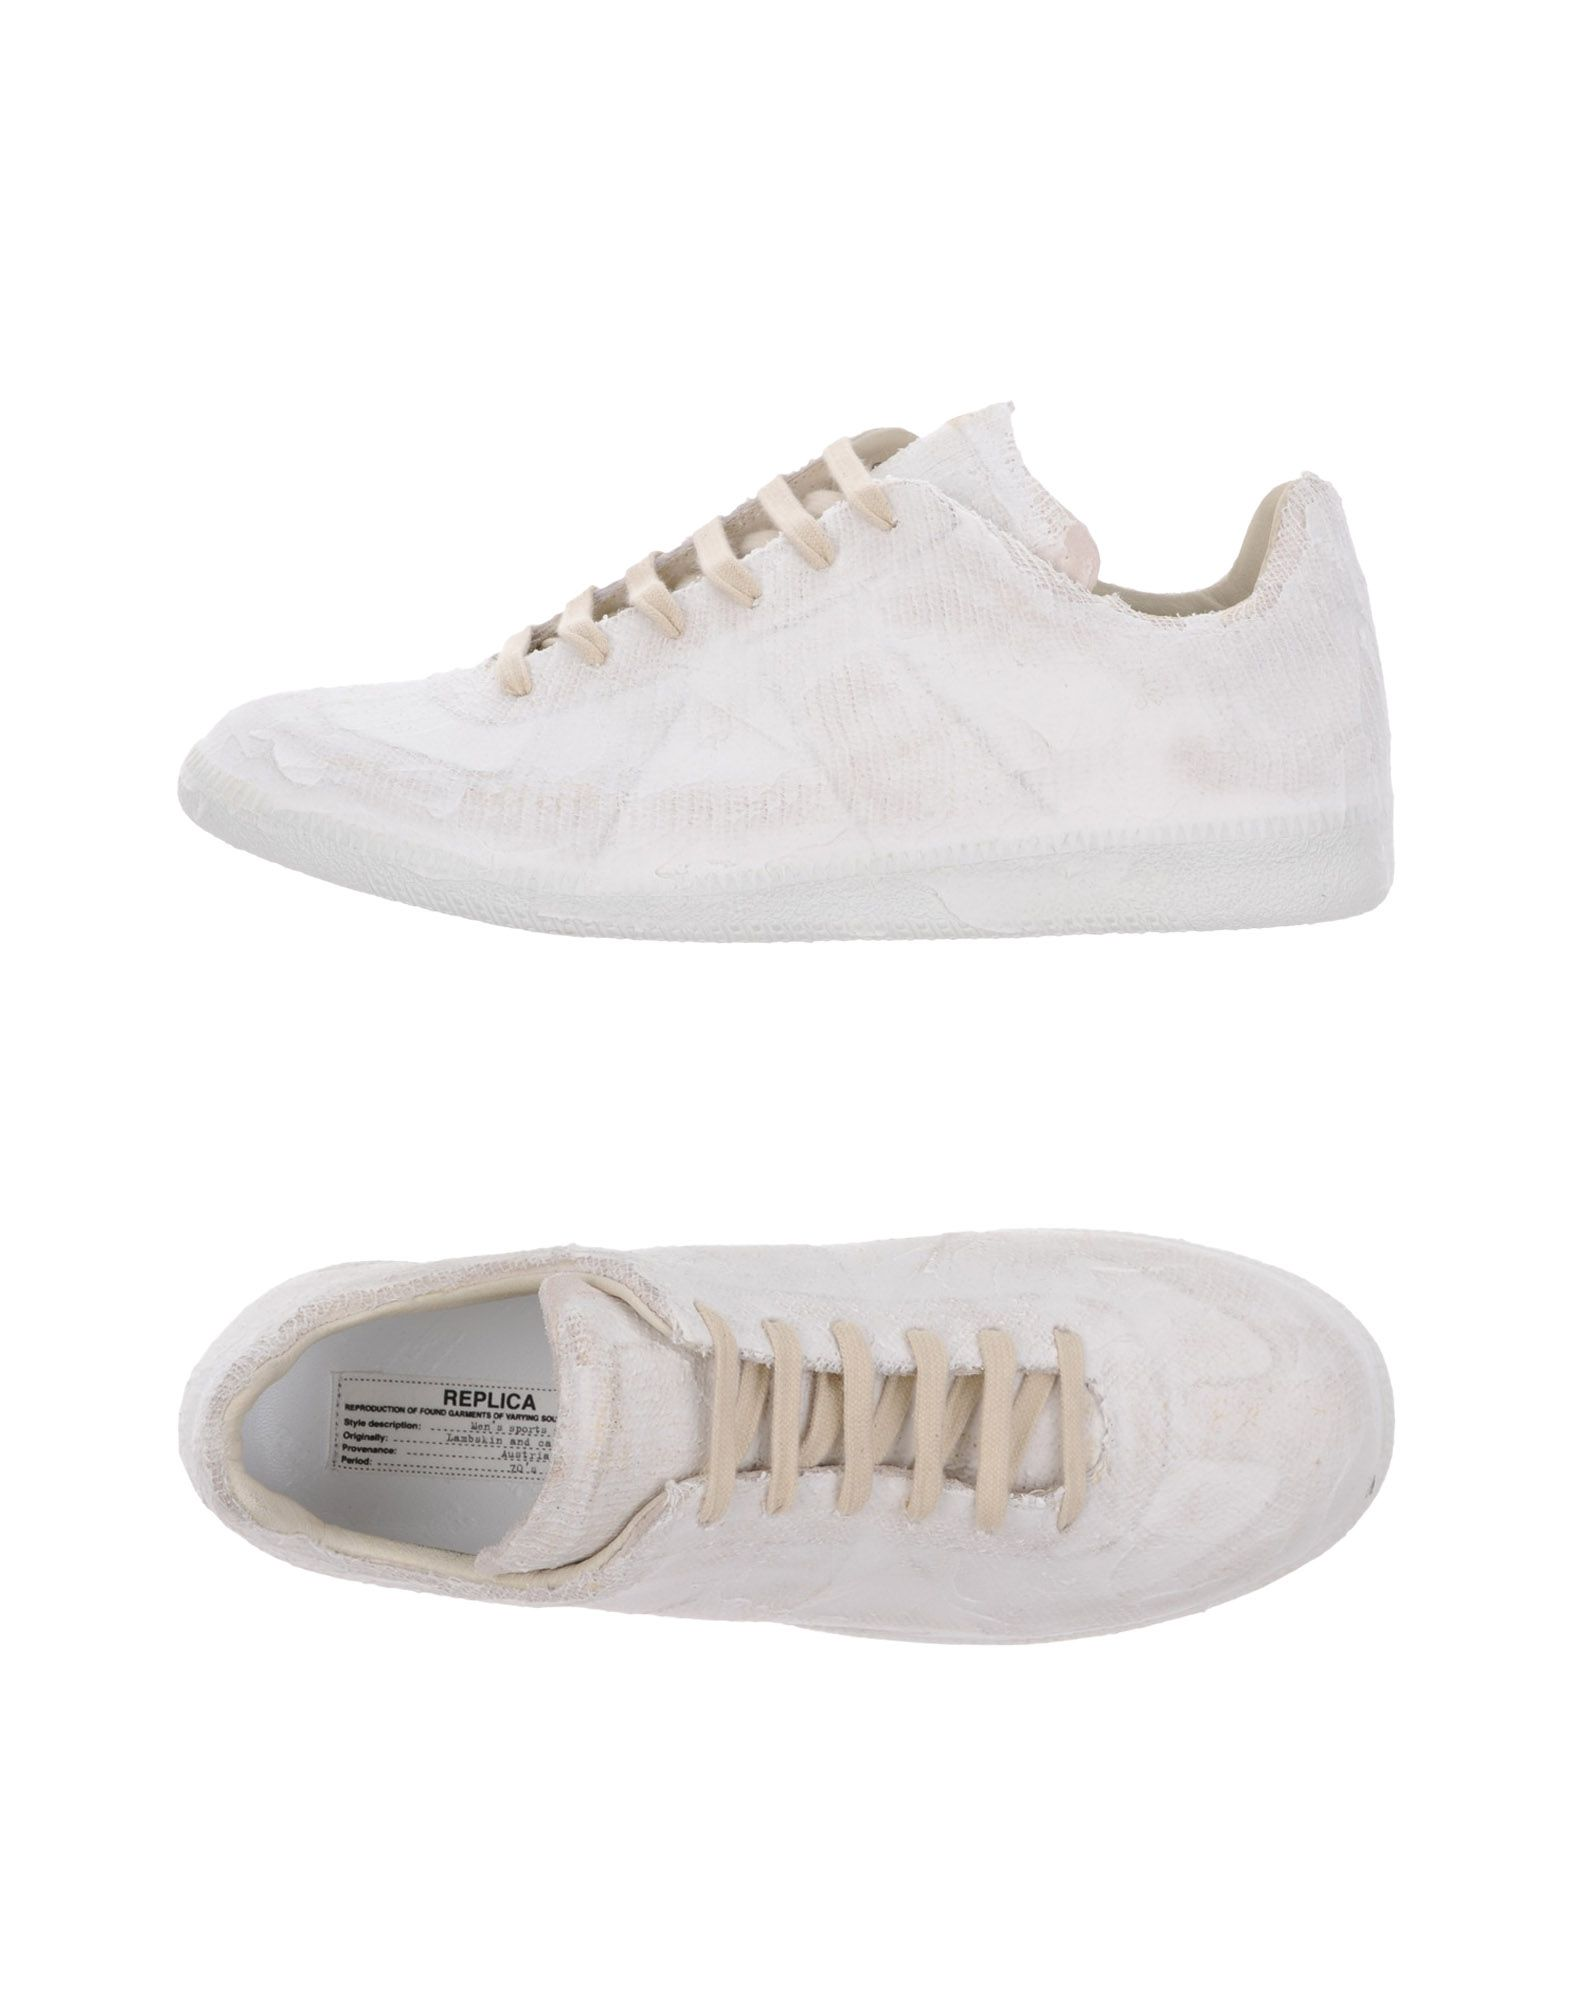 Maison Margiela Sneakers Herren  11288399DK Gute Qualität beliebte Schuhe